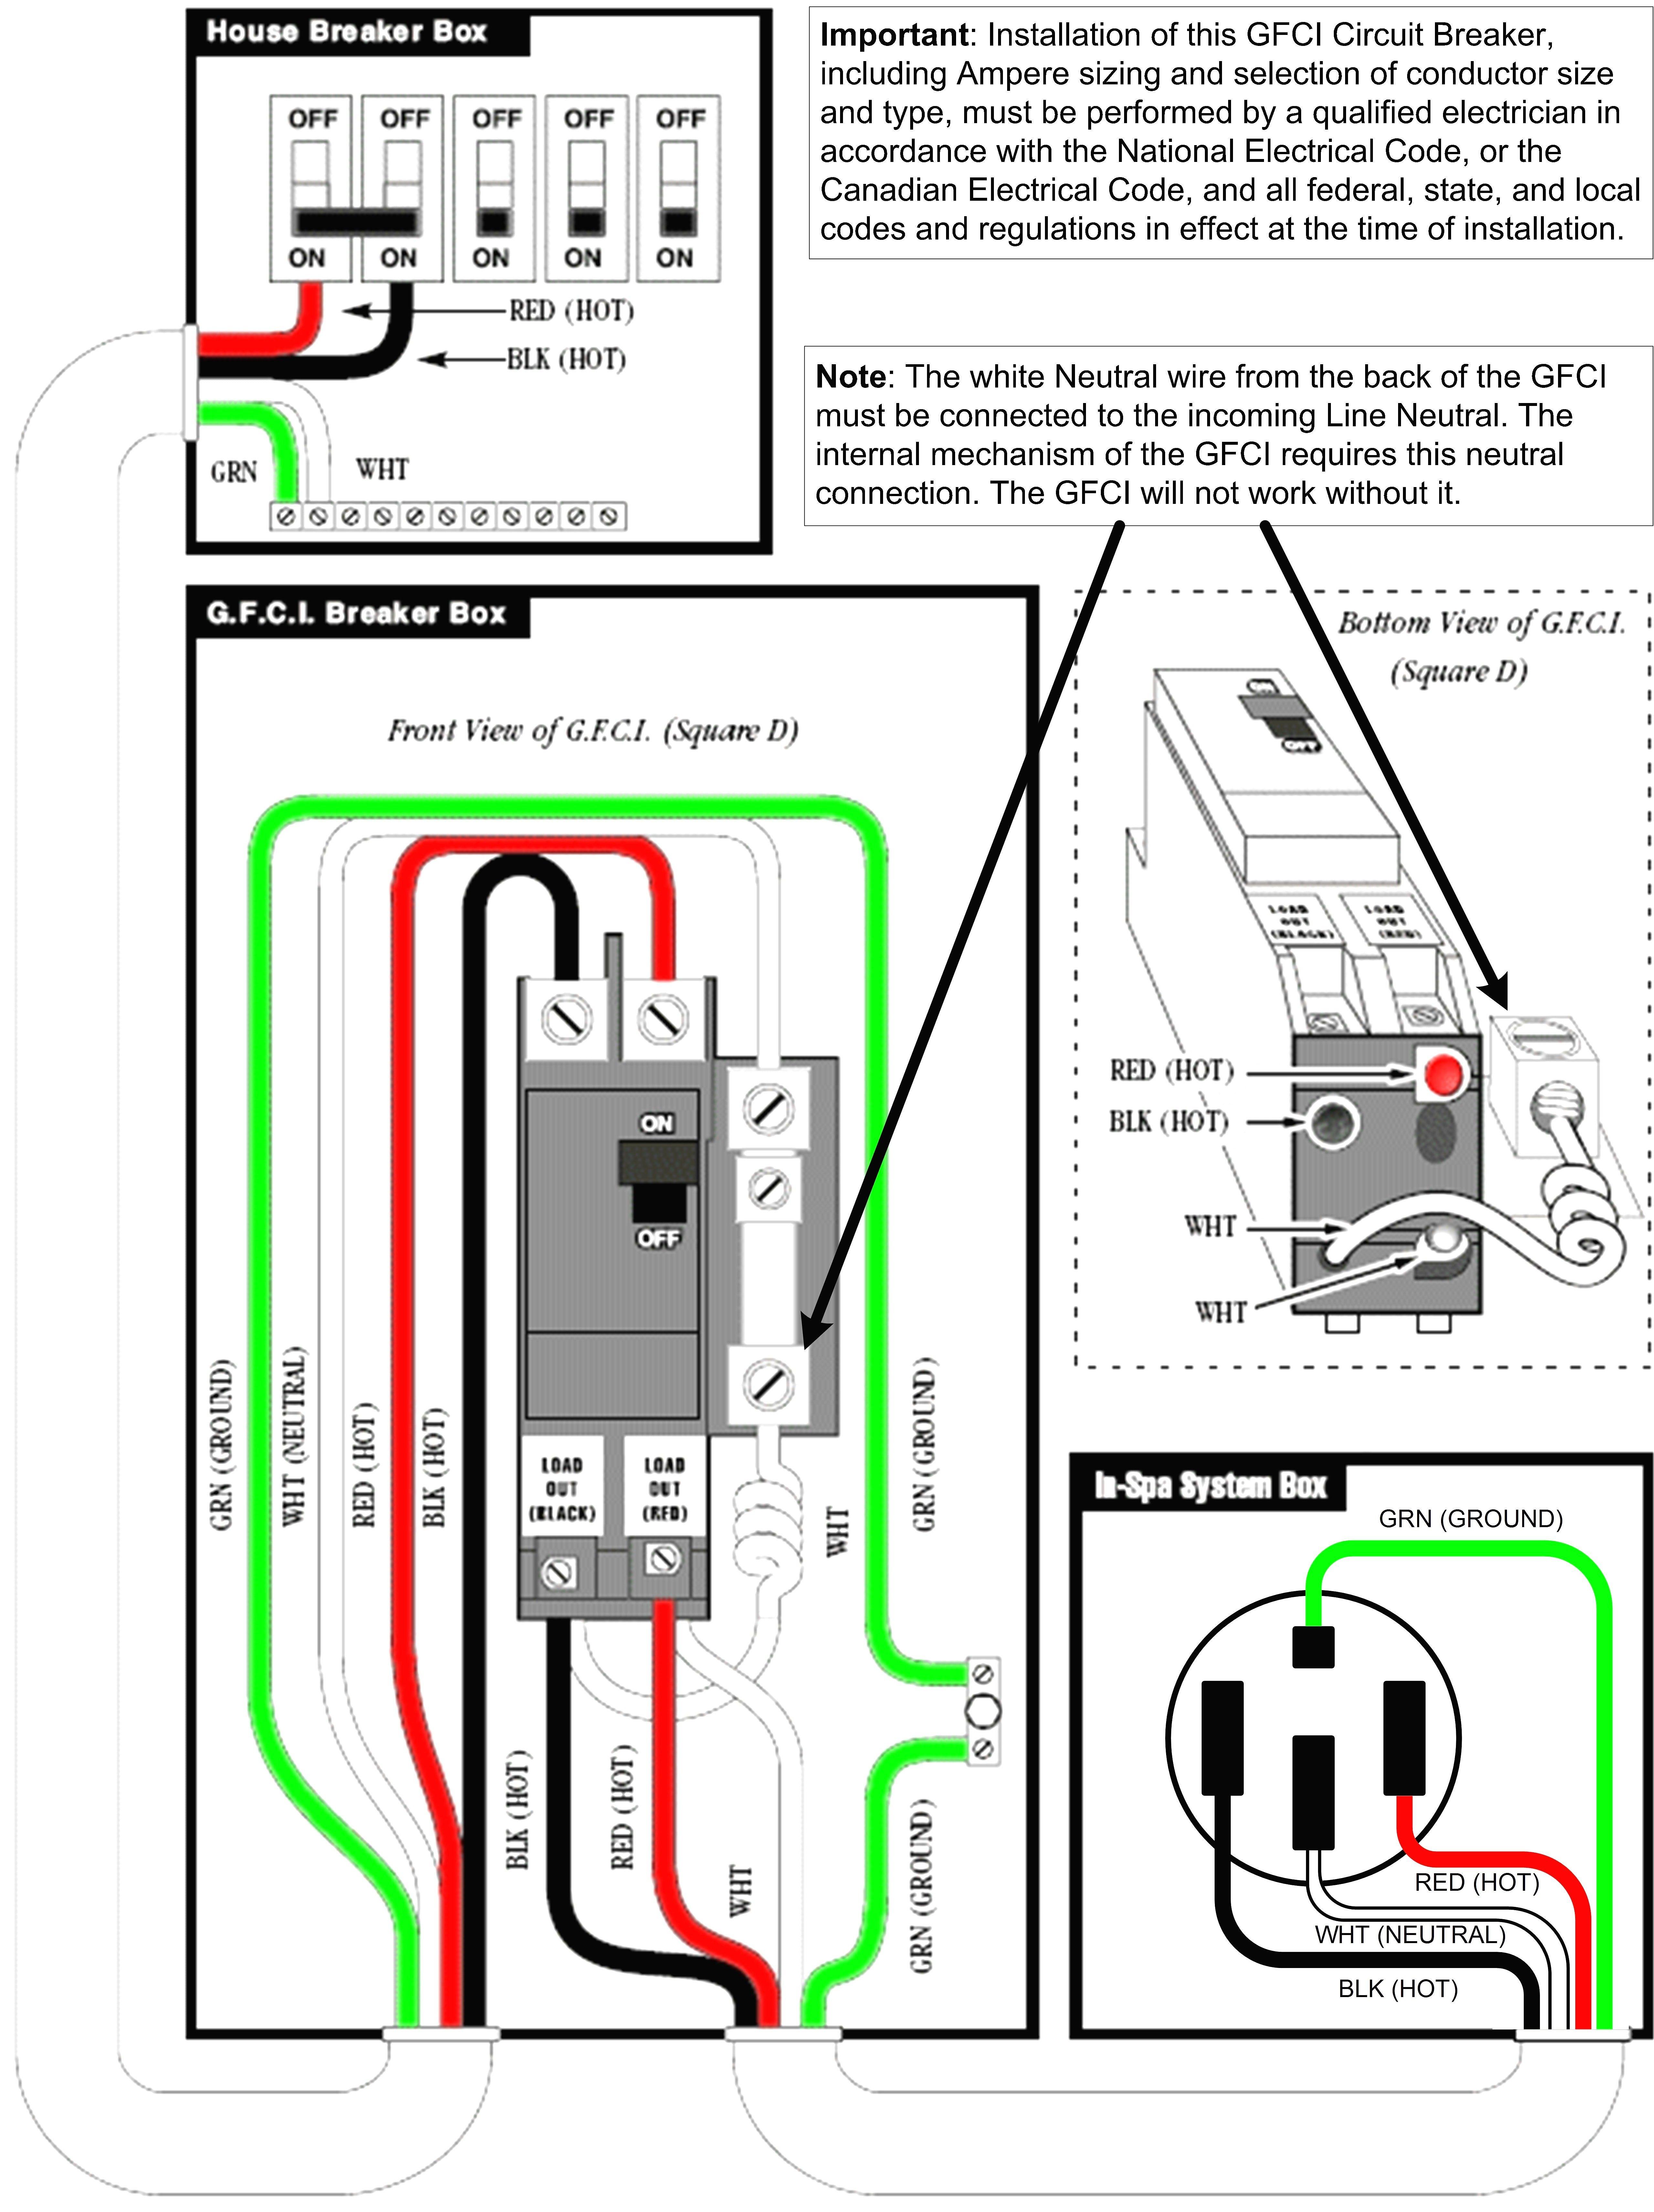 Unique Wiring Colors Electrical Diagram Wiringdiagram Diagramming Diagramm Visuals Visua Outlet Wiring Electrical Panel Wiring Electrical Circuit Diagram